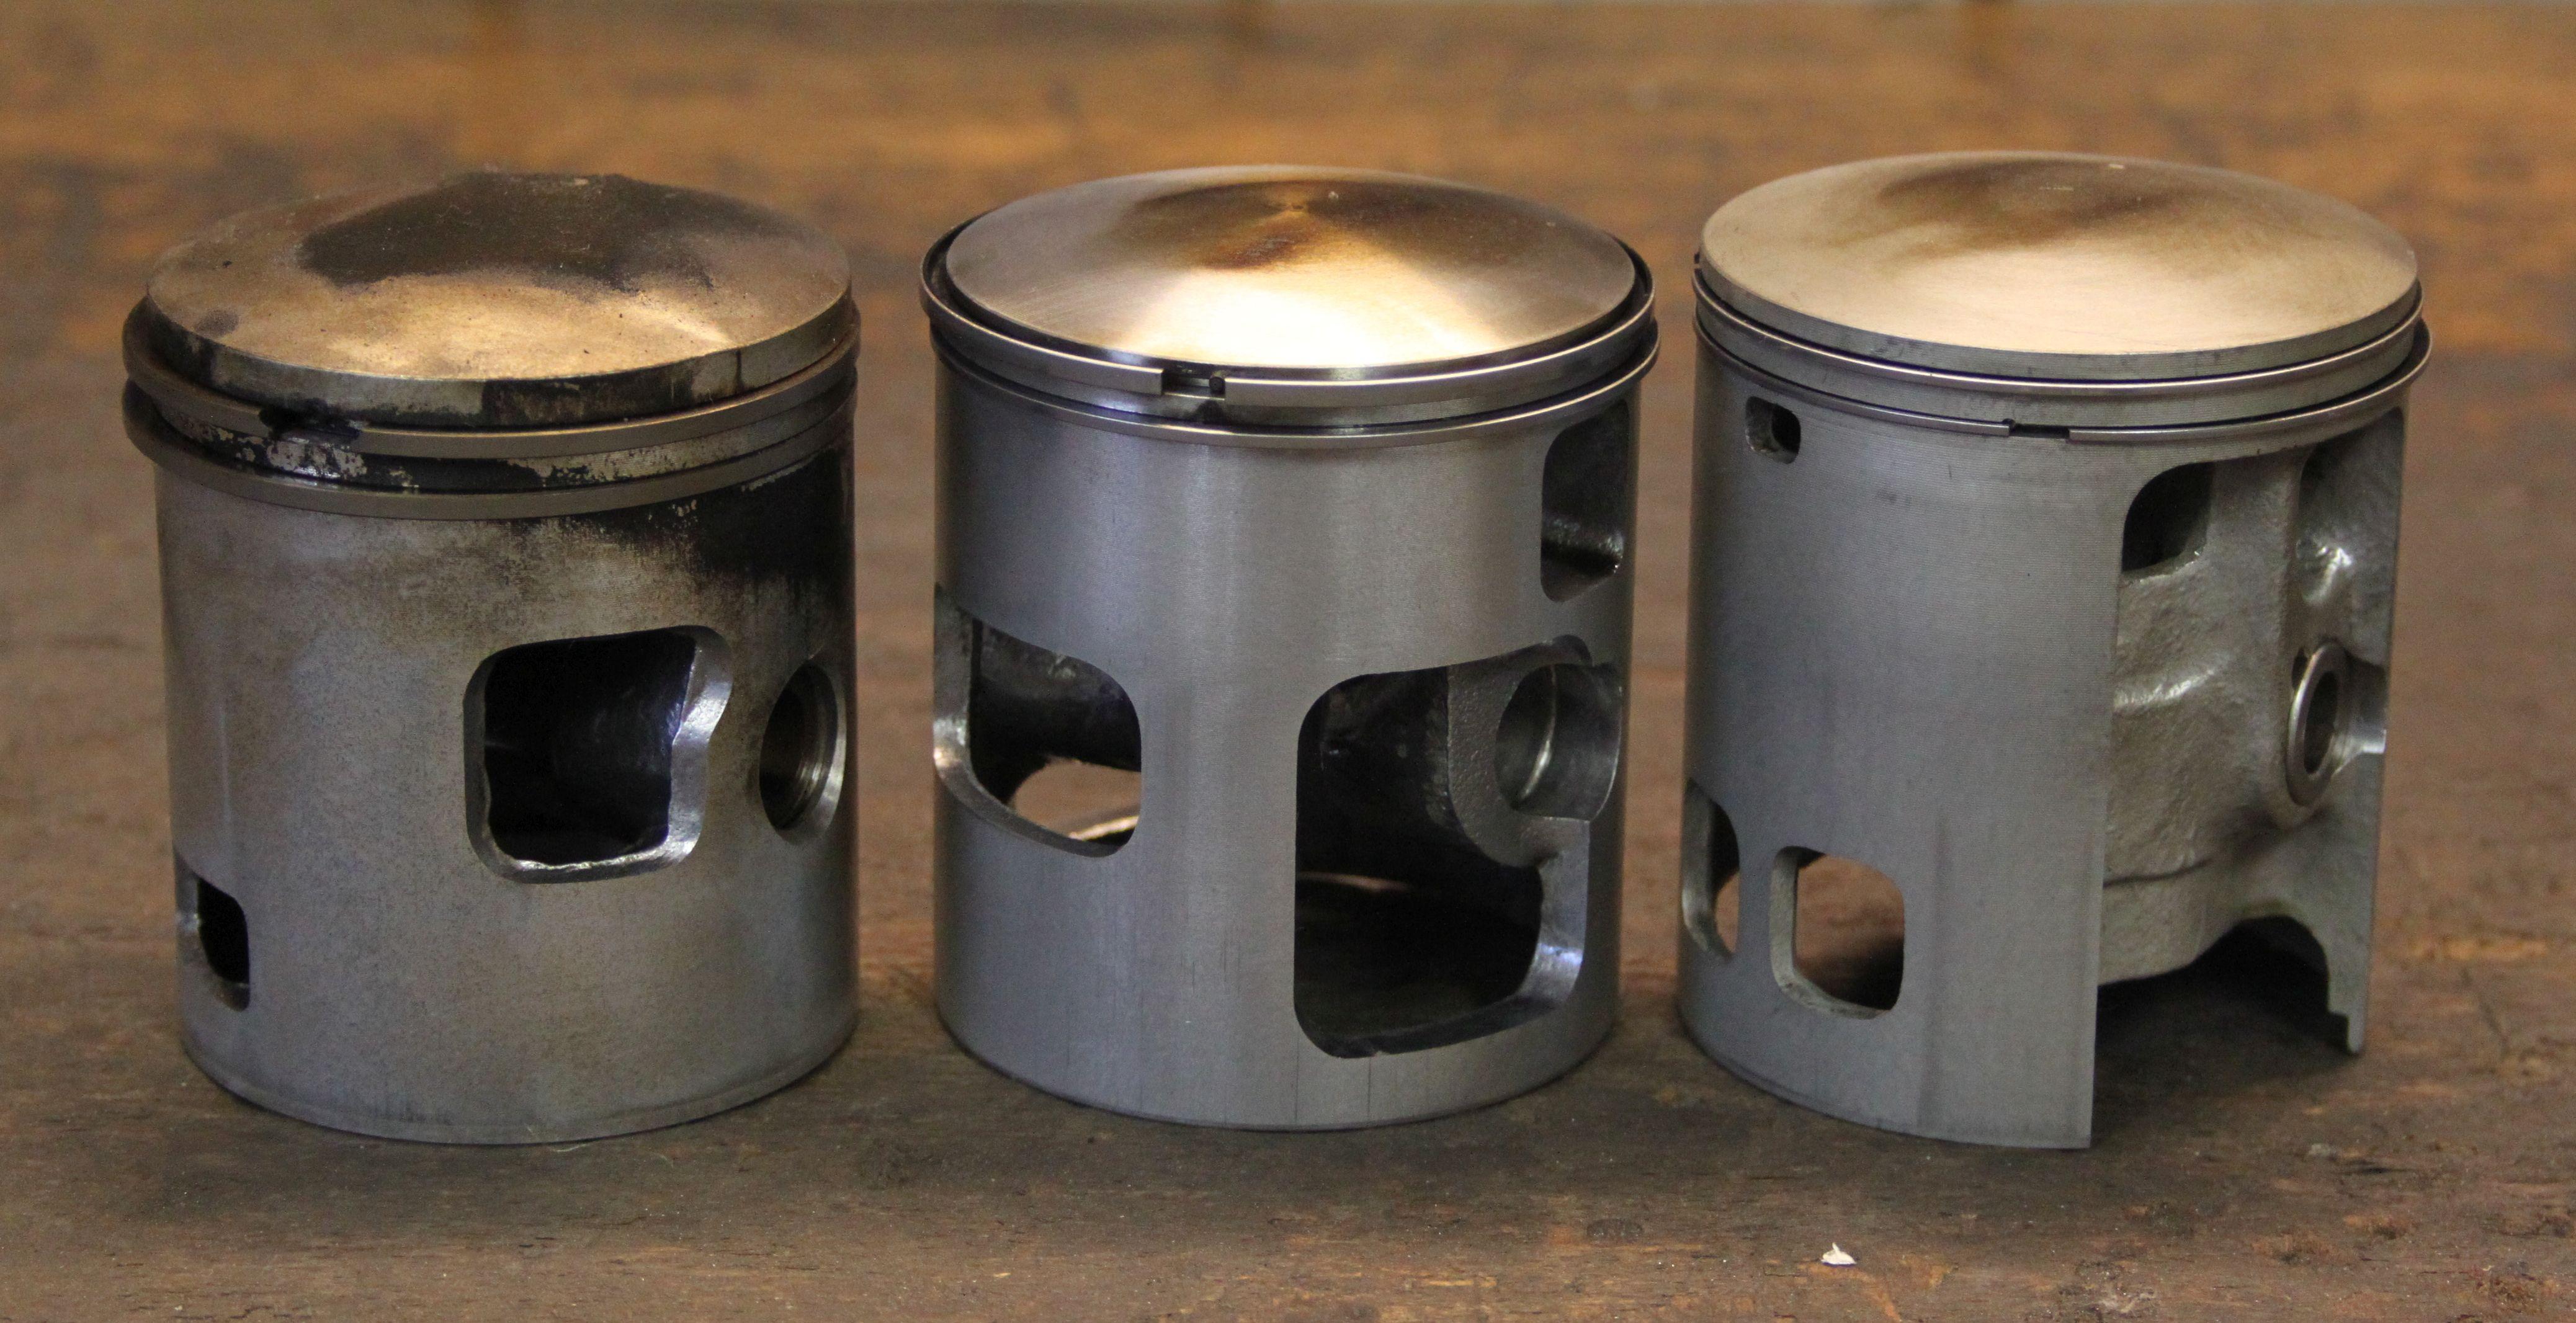 Zylindertest-Kolben-Vespa-PX-200-rollerJOURNAL-Polini-Malossi-Piaggio-wms24de